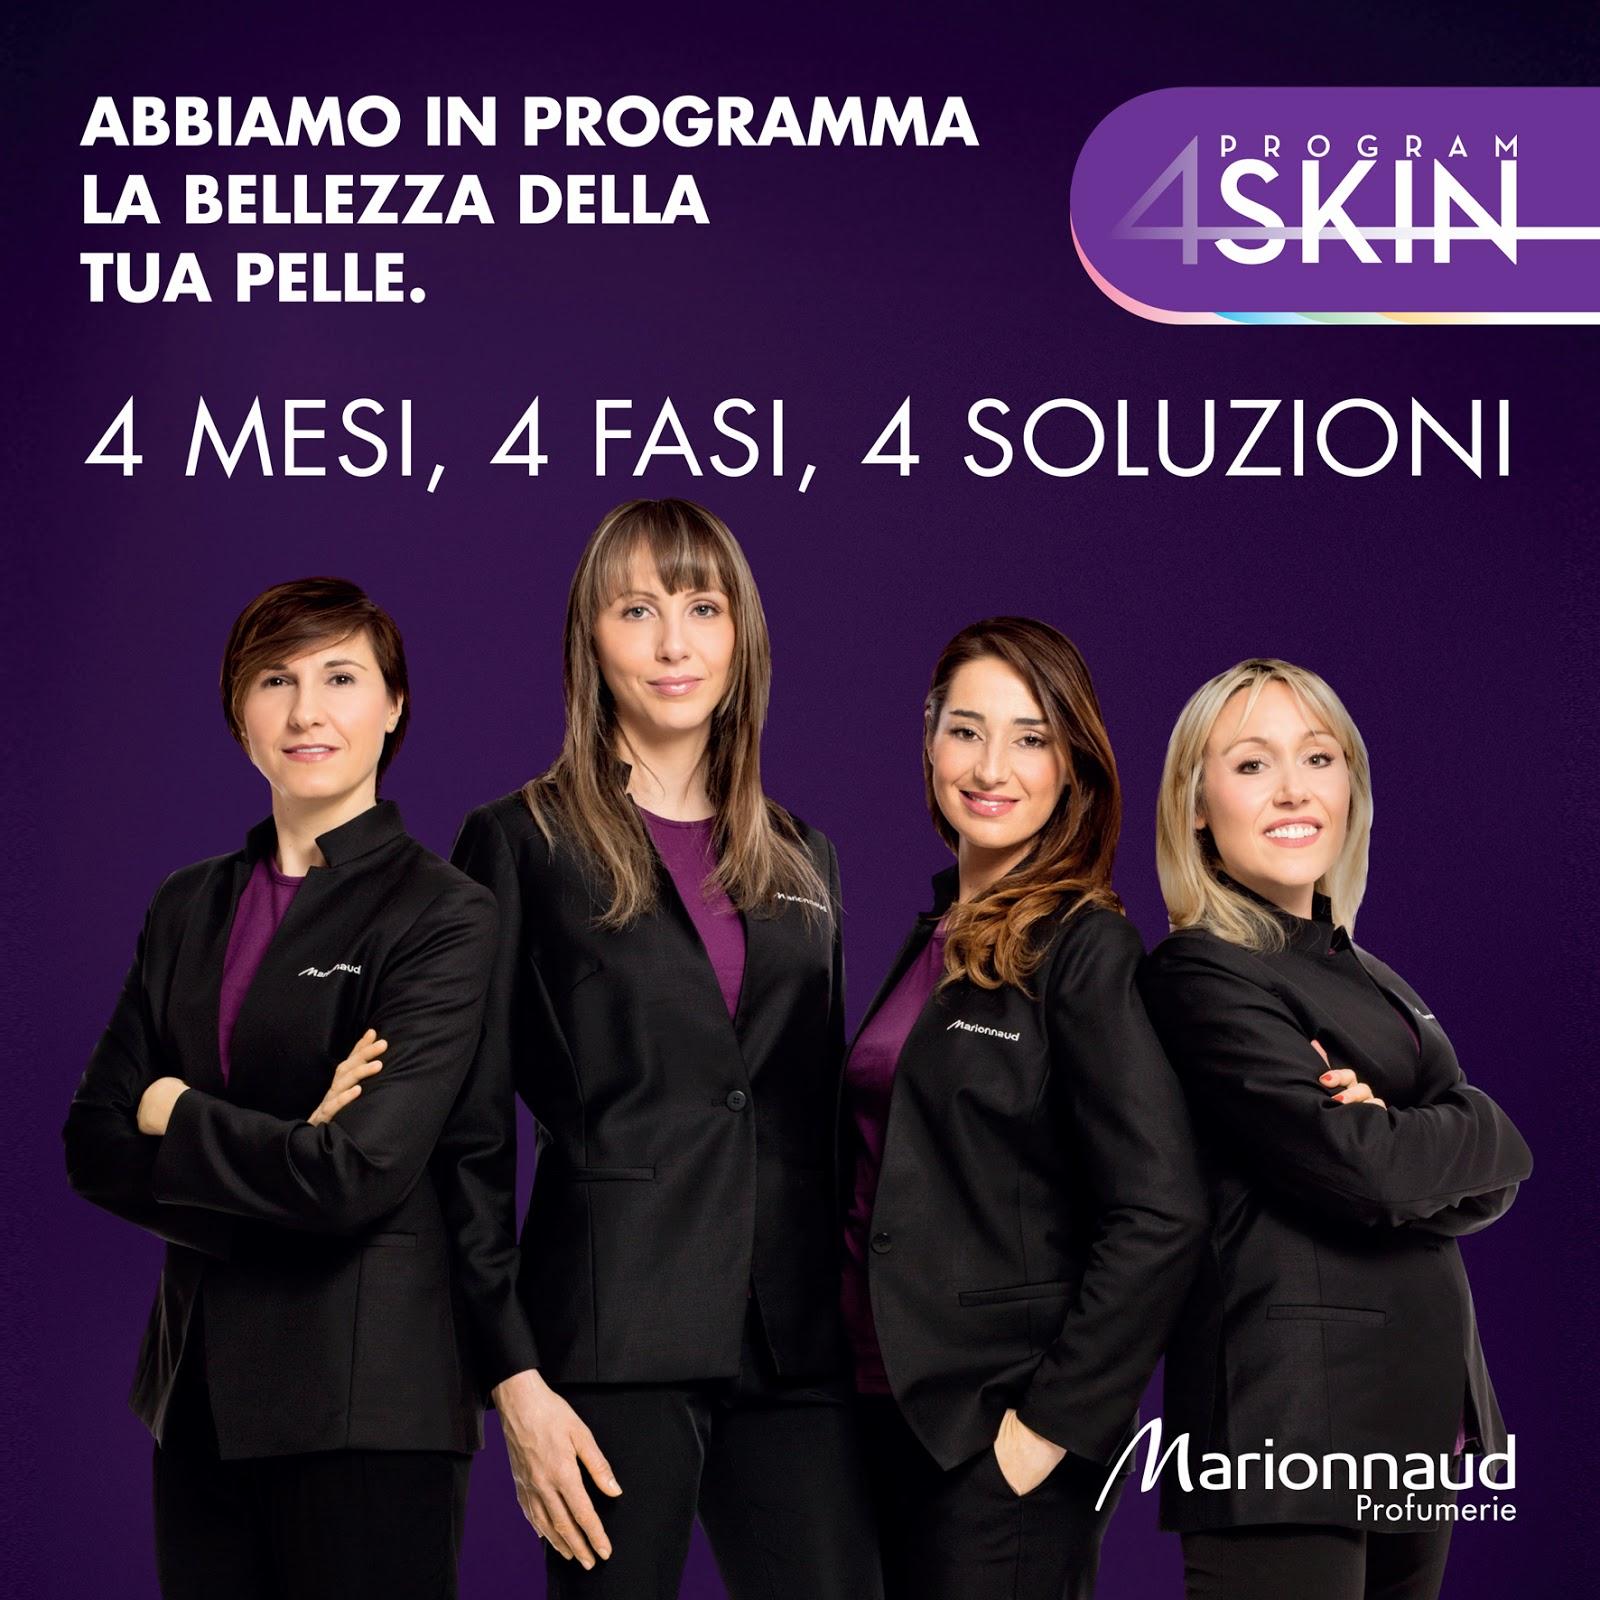 marionnaud 4skin program: fase 3 viso